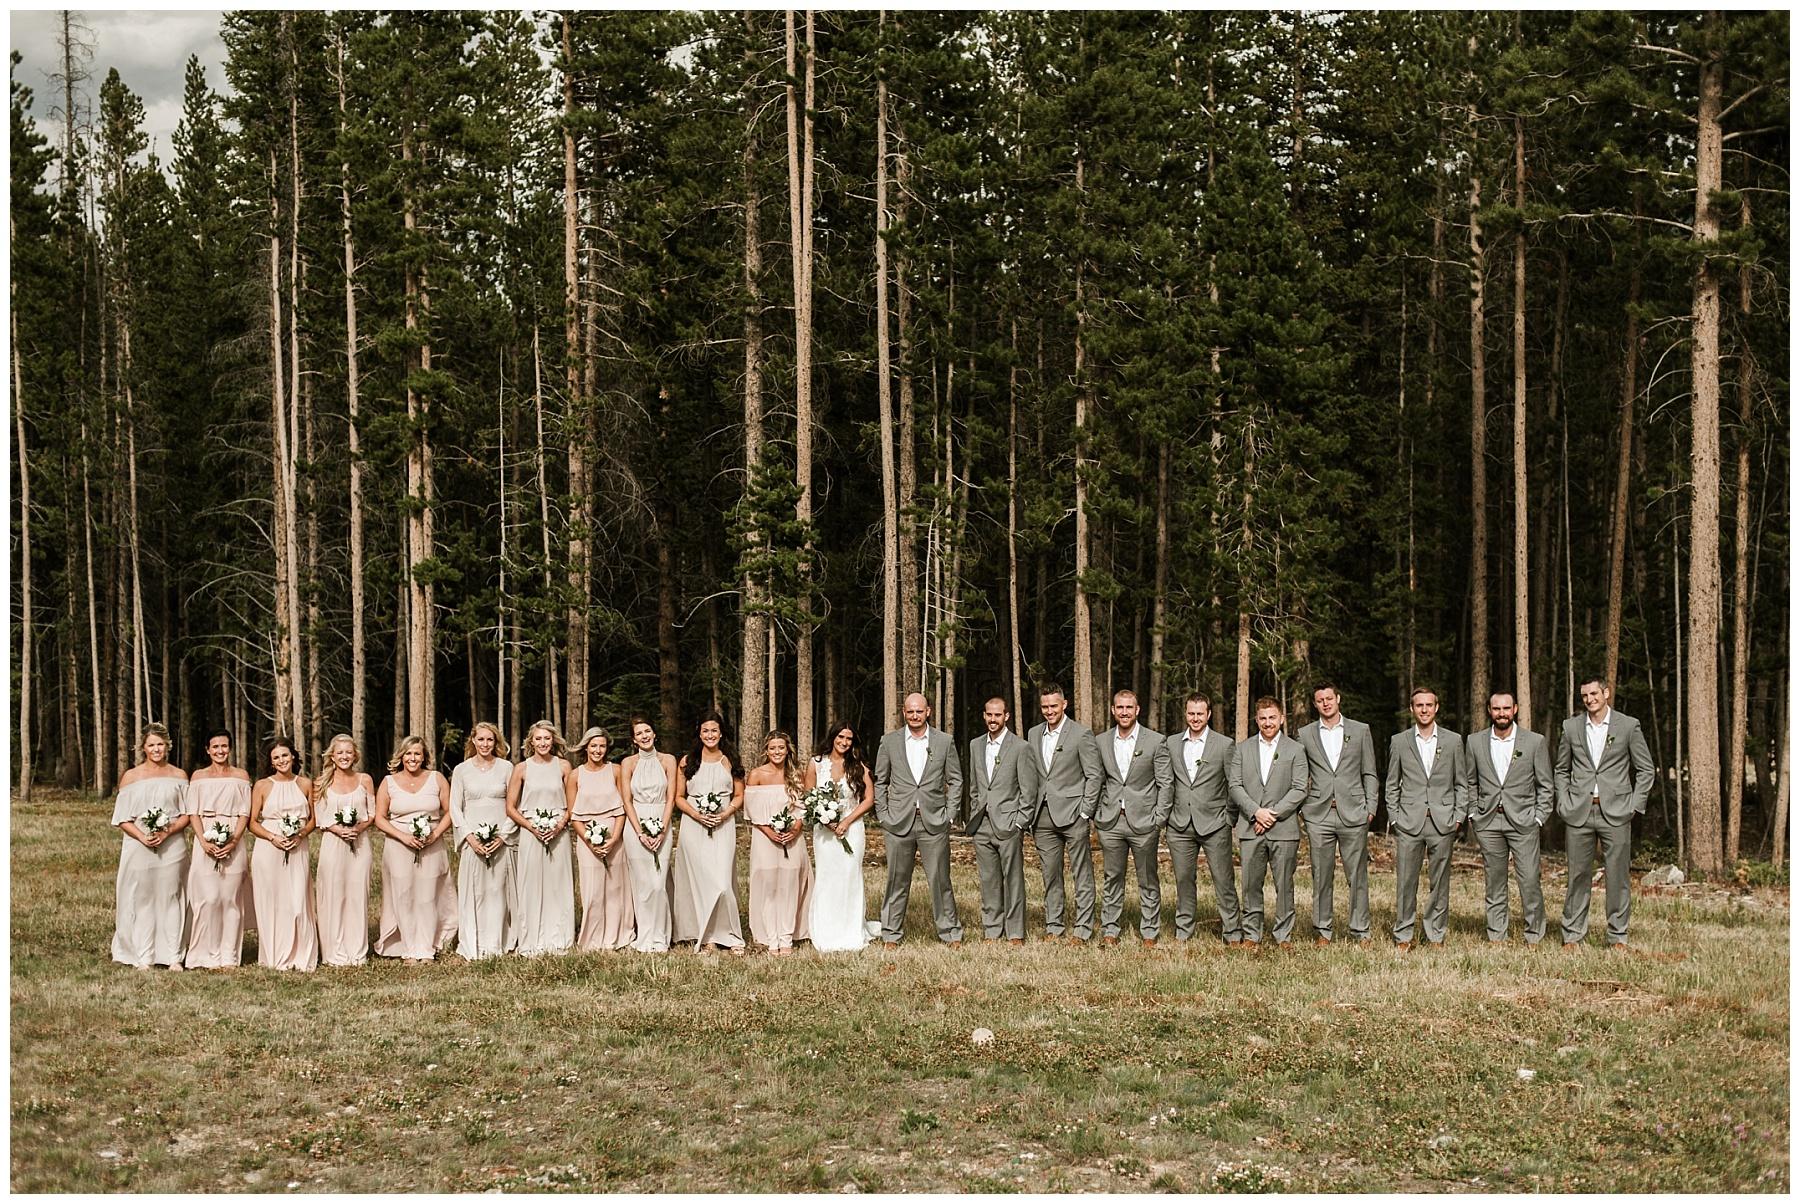 Katesalleyphotography-242_married in Breckenridge.jpg